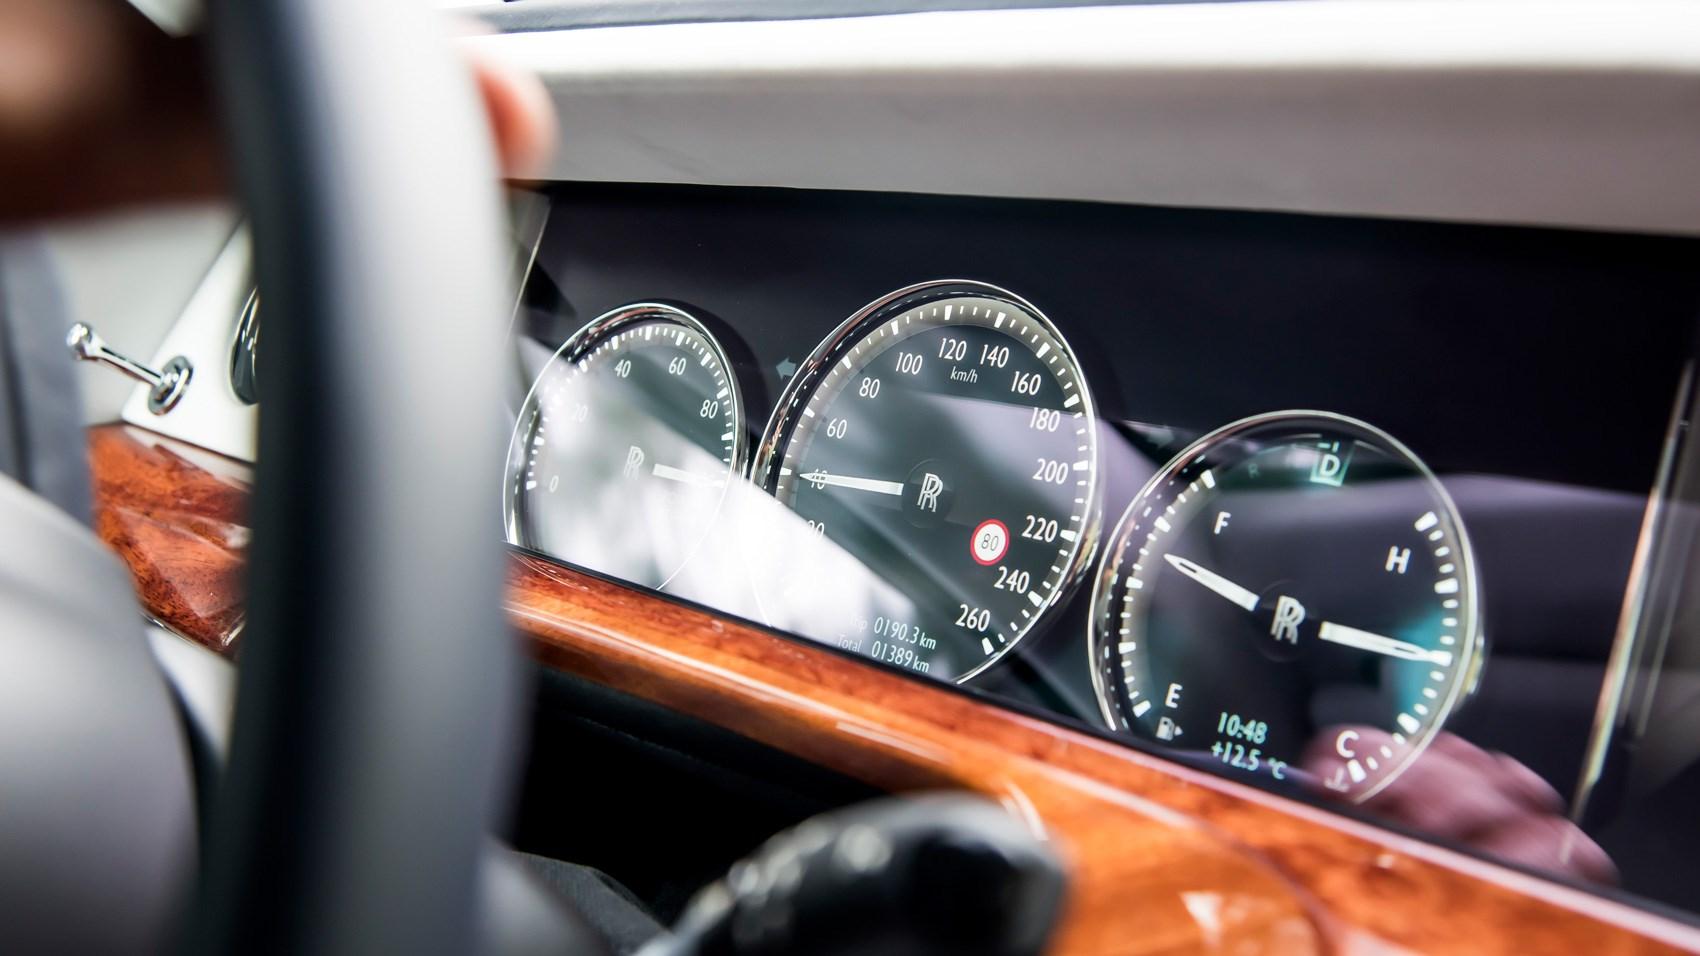 Rolls-Royce Phantom instrument cluster